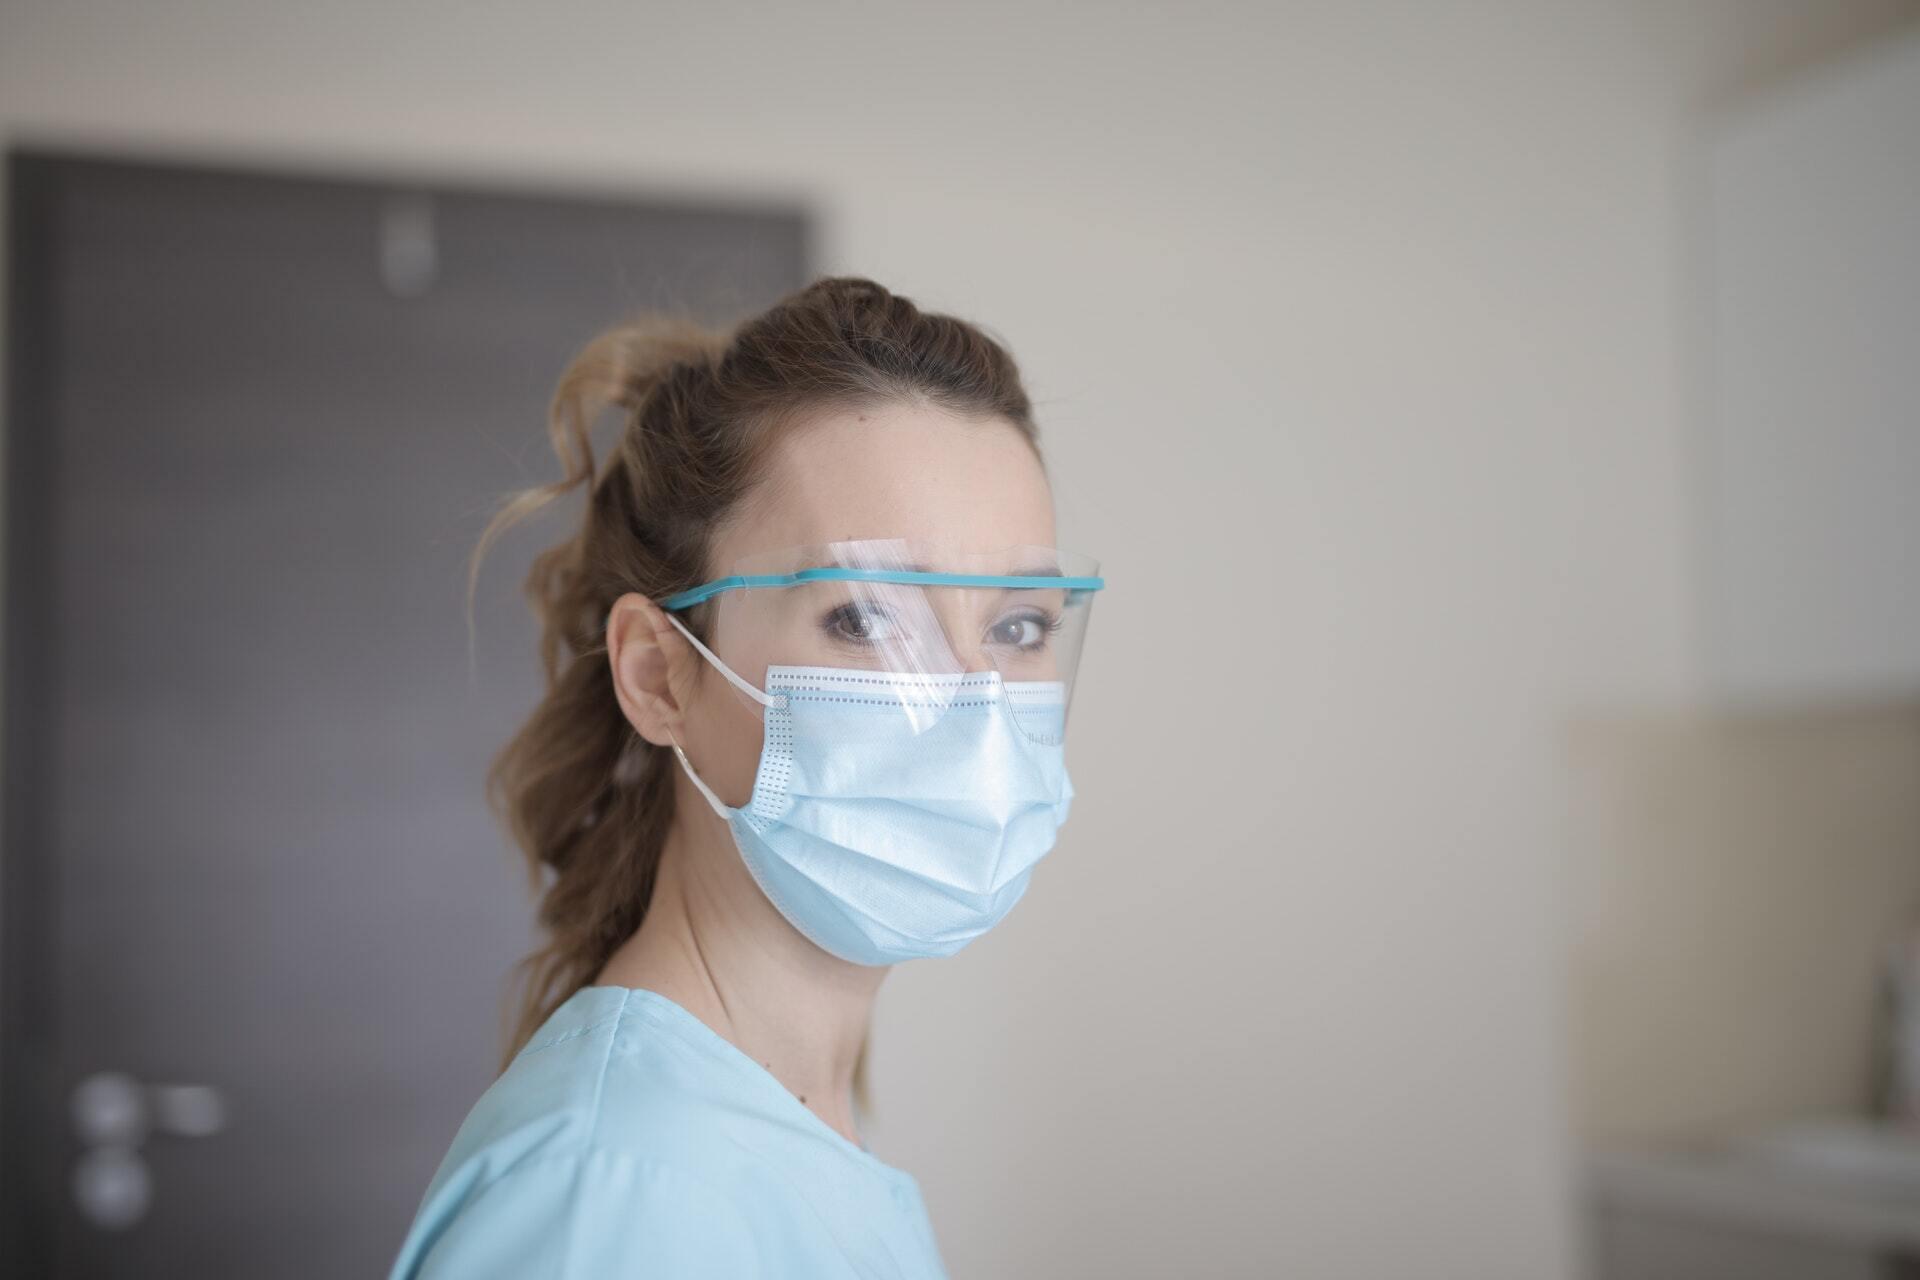 Woman nurse in blue shirt wearing face mask